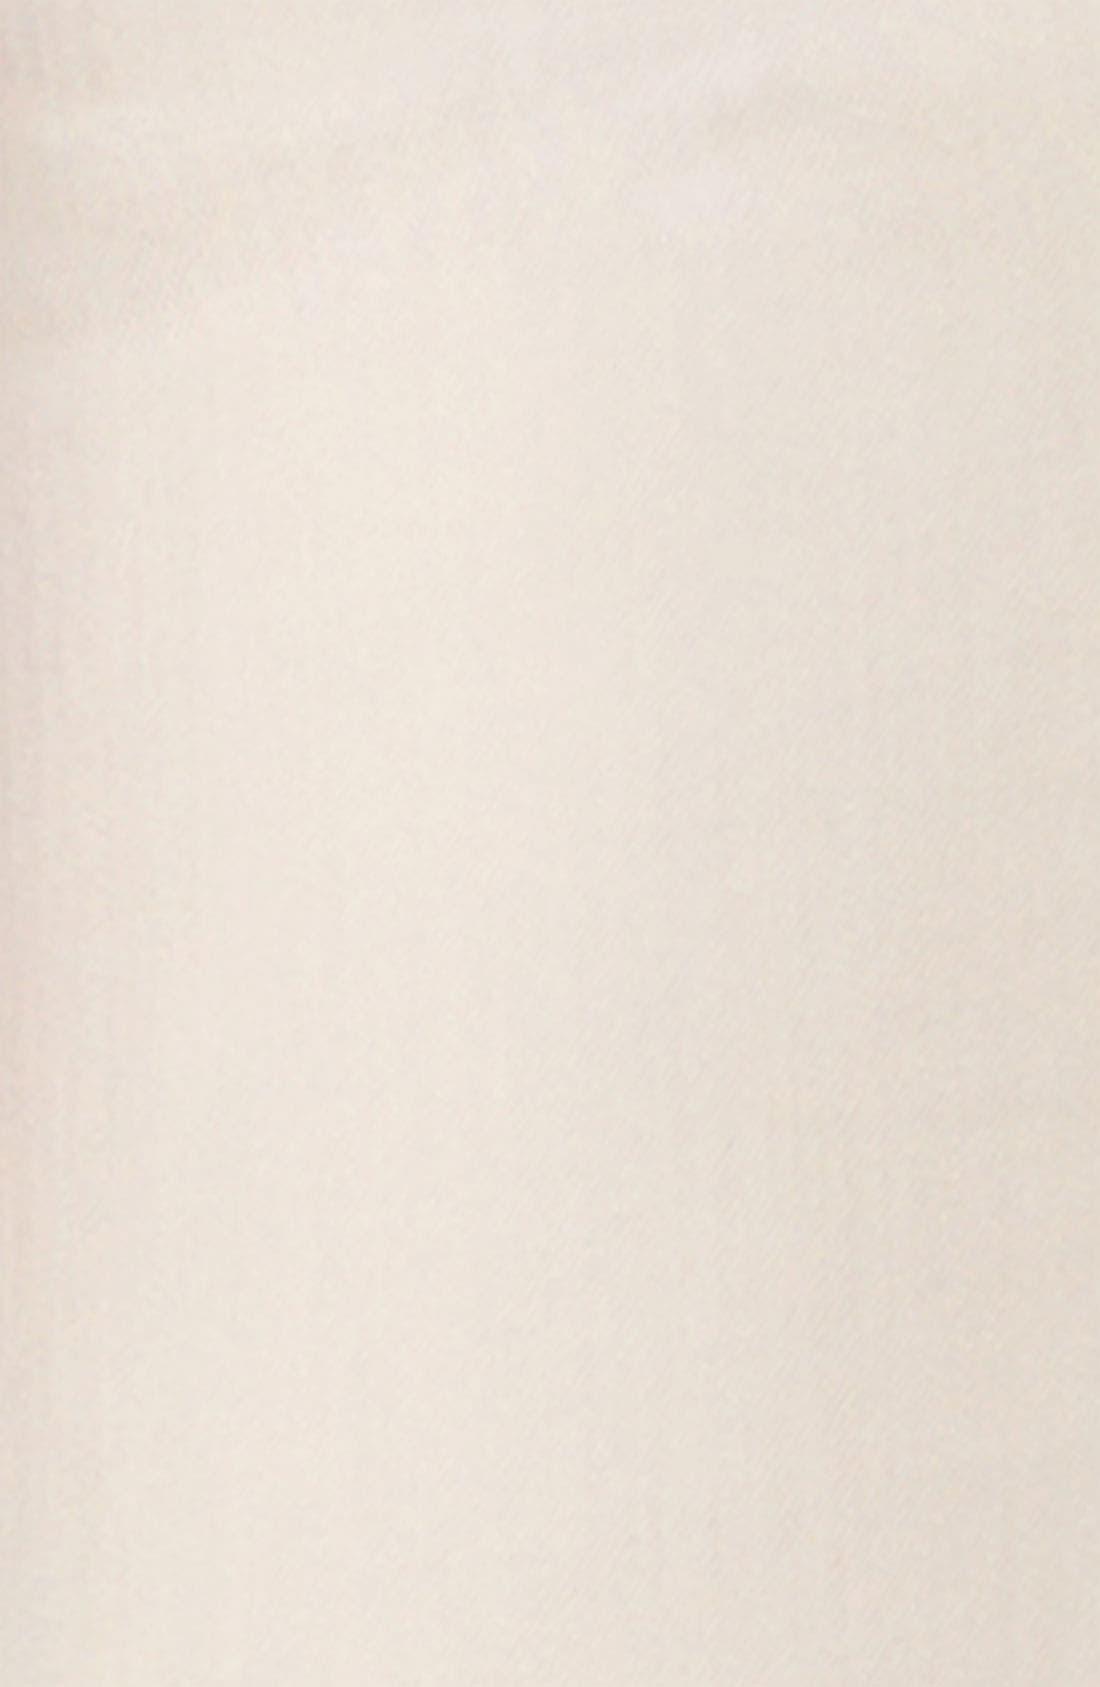 'Darkside' Bleached Skinny Jeans,                             Alternate thumbnail 5, color,                             Blanc